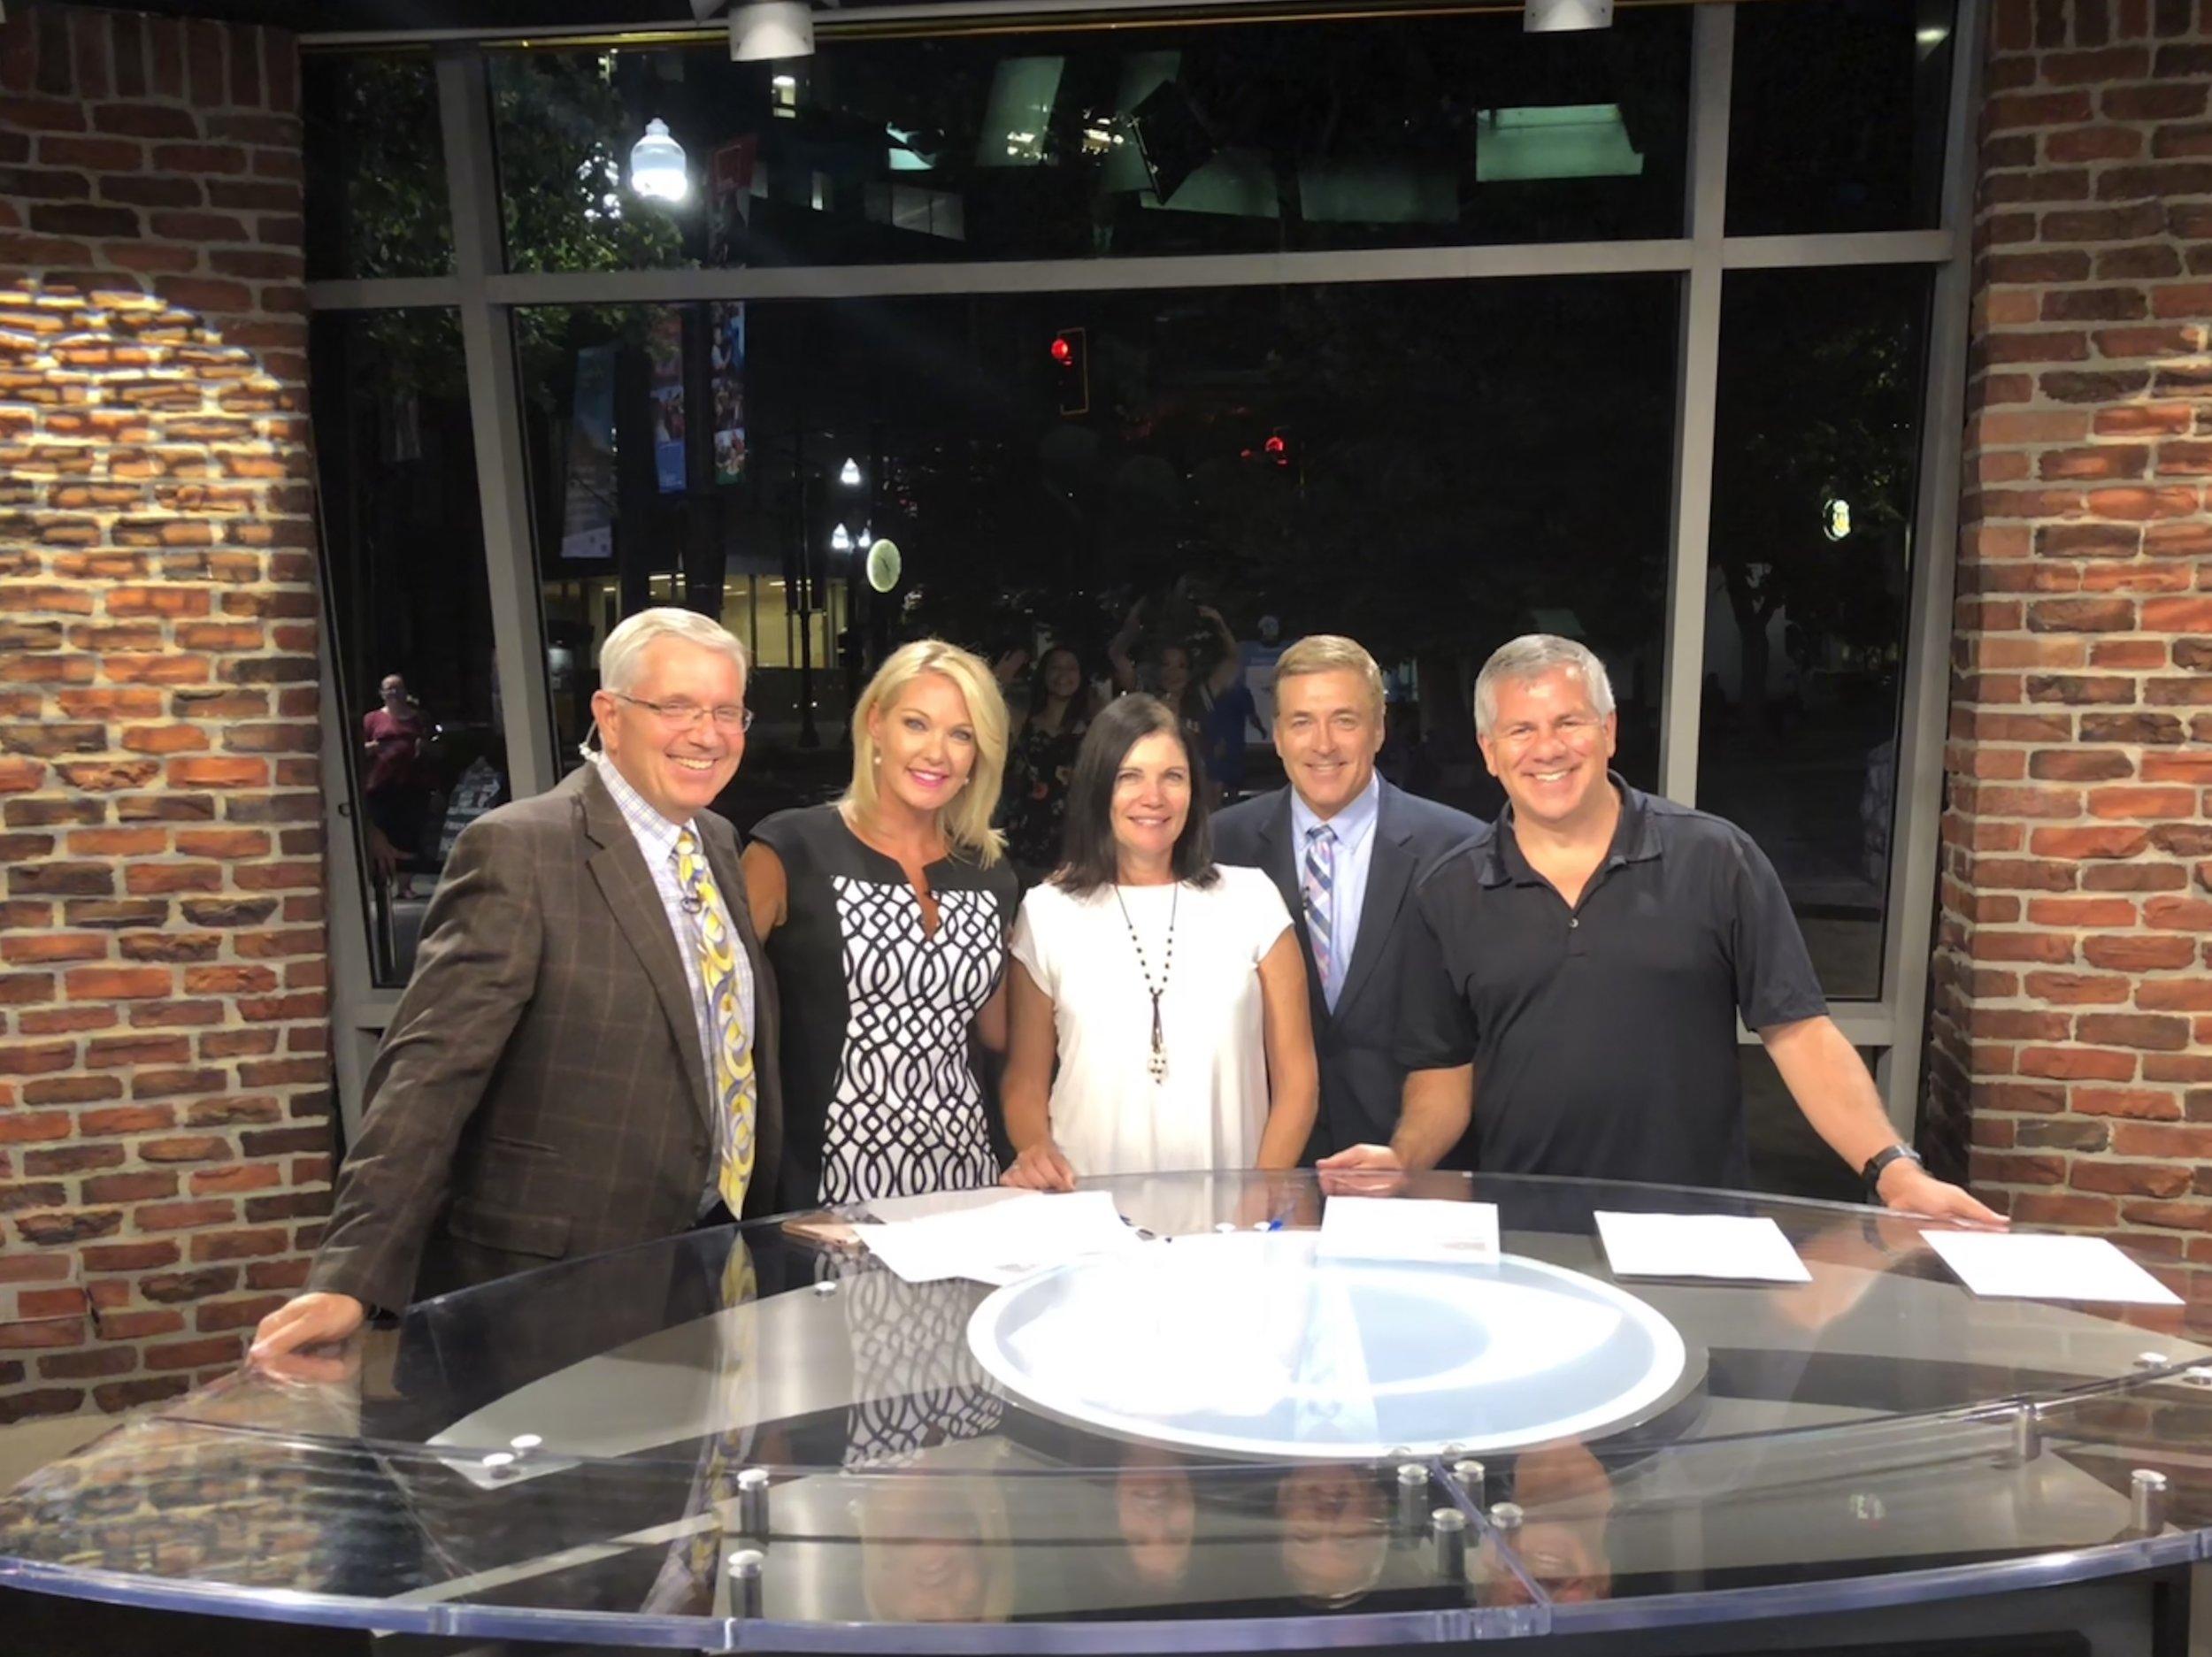 With anchors Shauna Lake, Mark Koelbel and Sterling Poulson at CBS affiliate KUTV